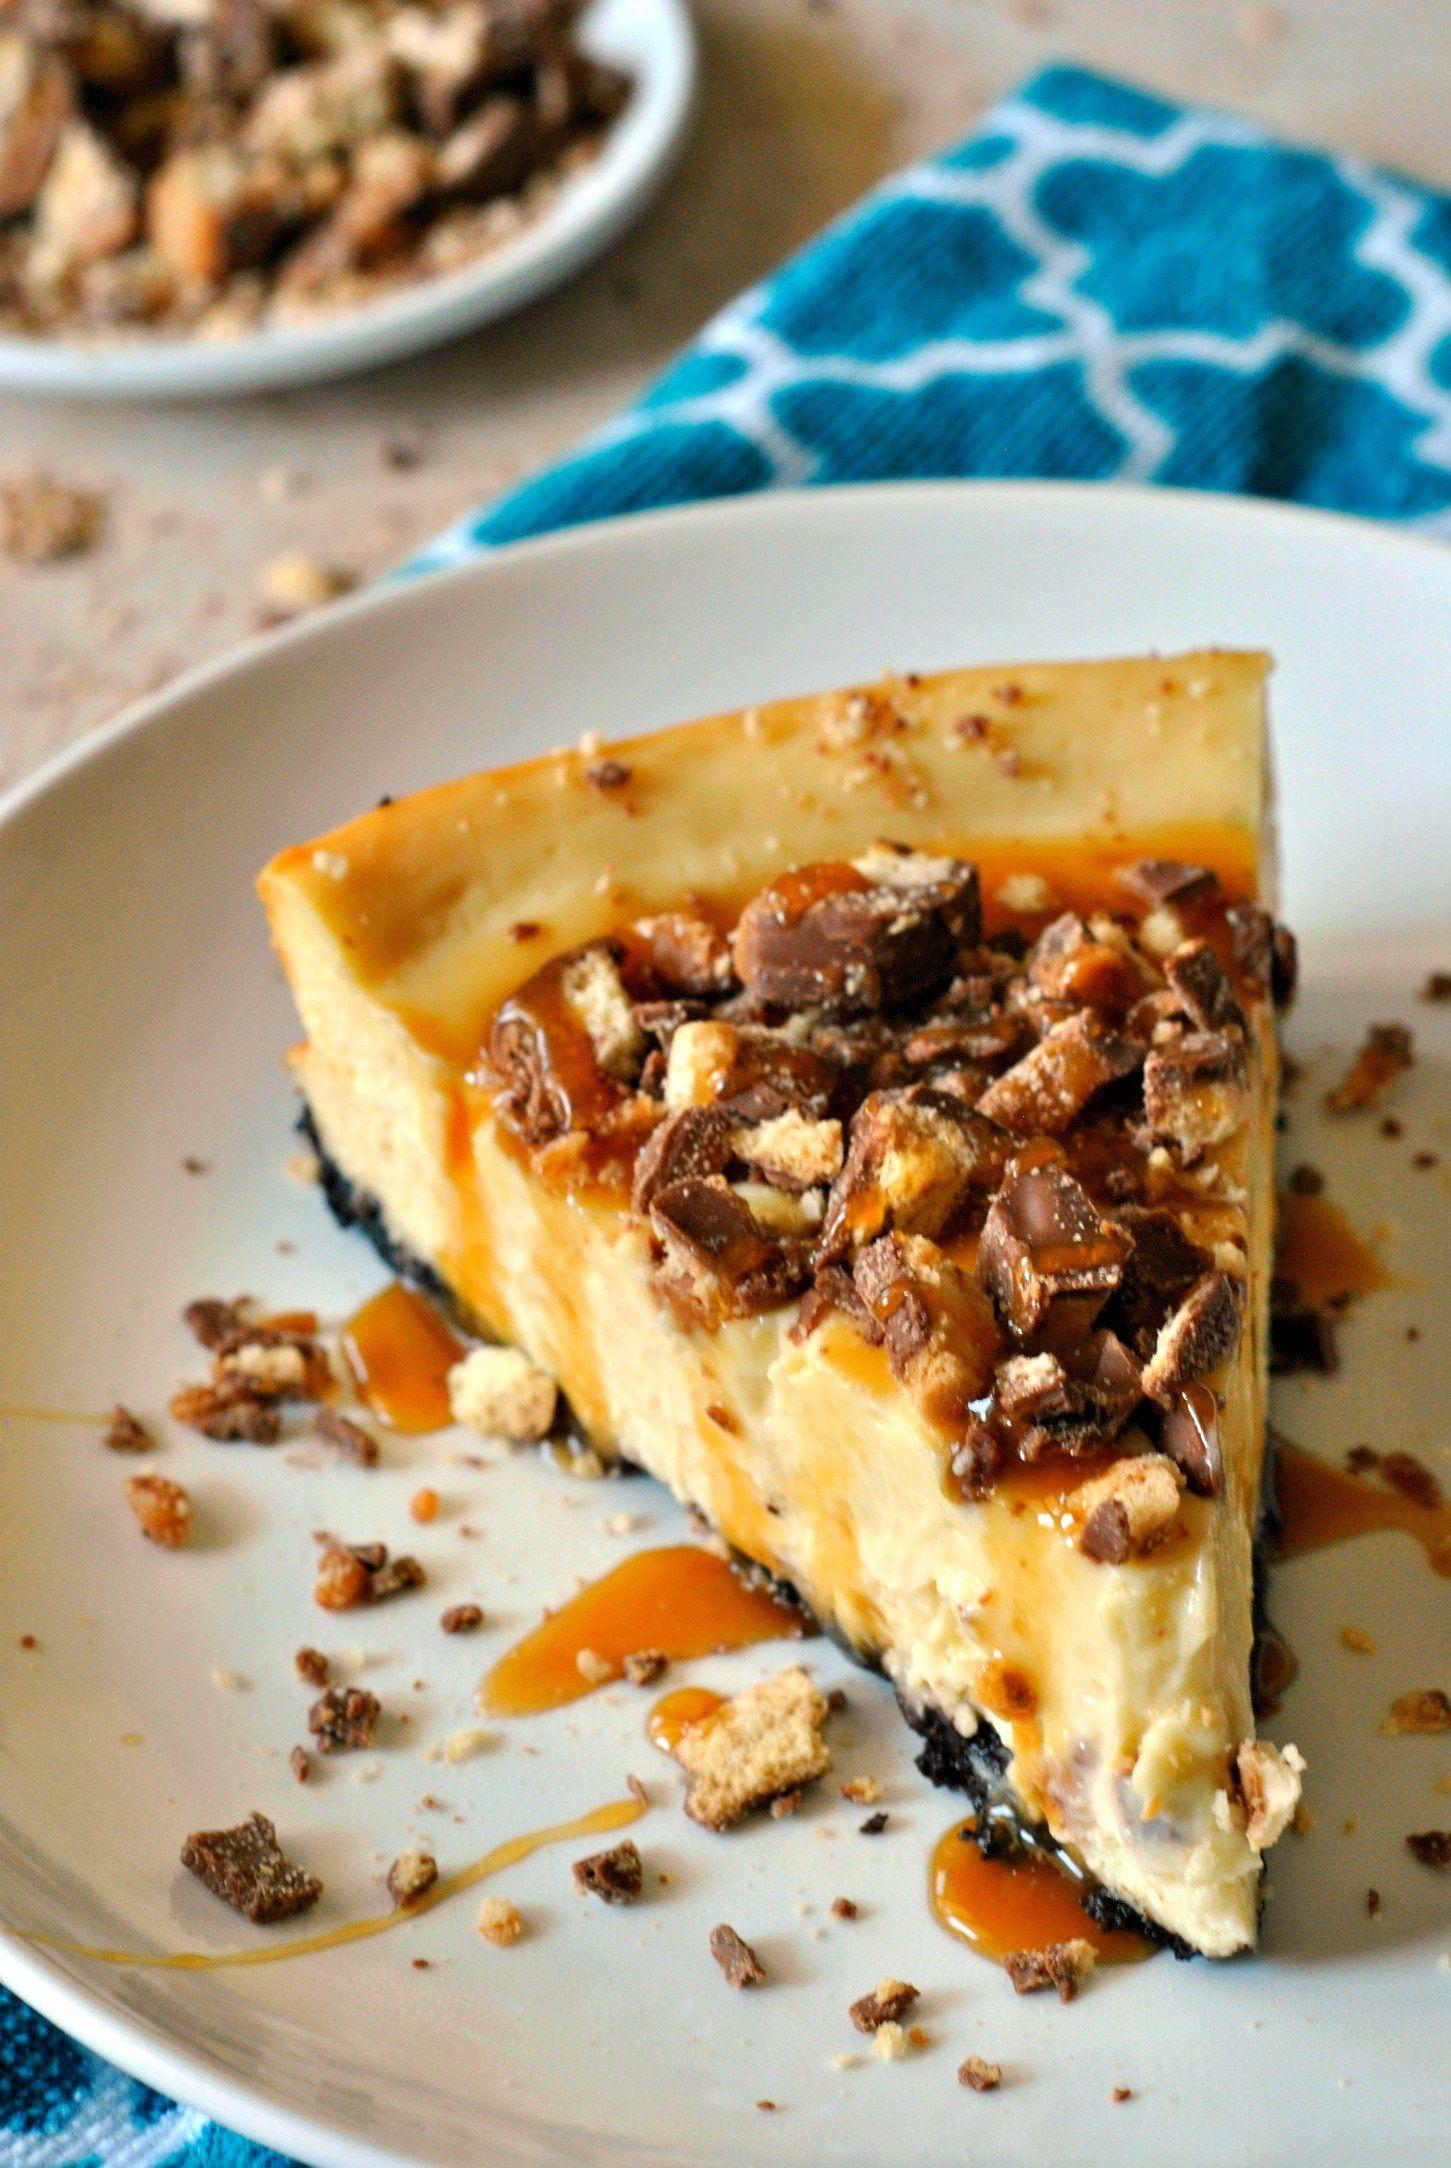 Chocolate oreo crust smooth cheesecake chopped twix bars